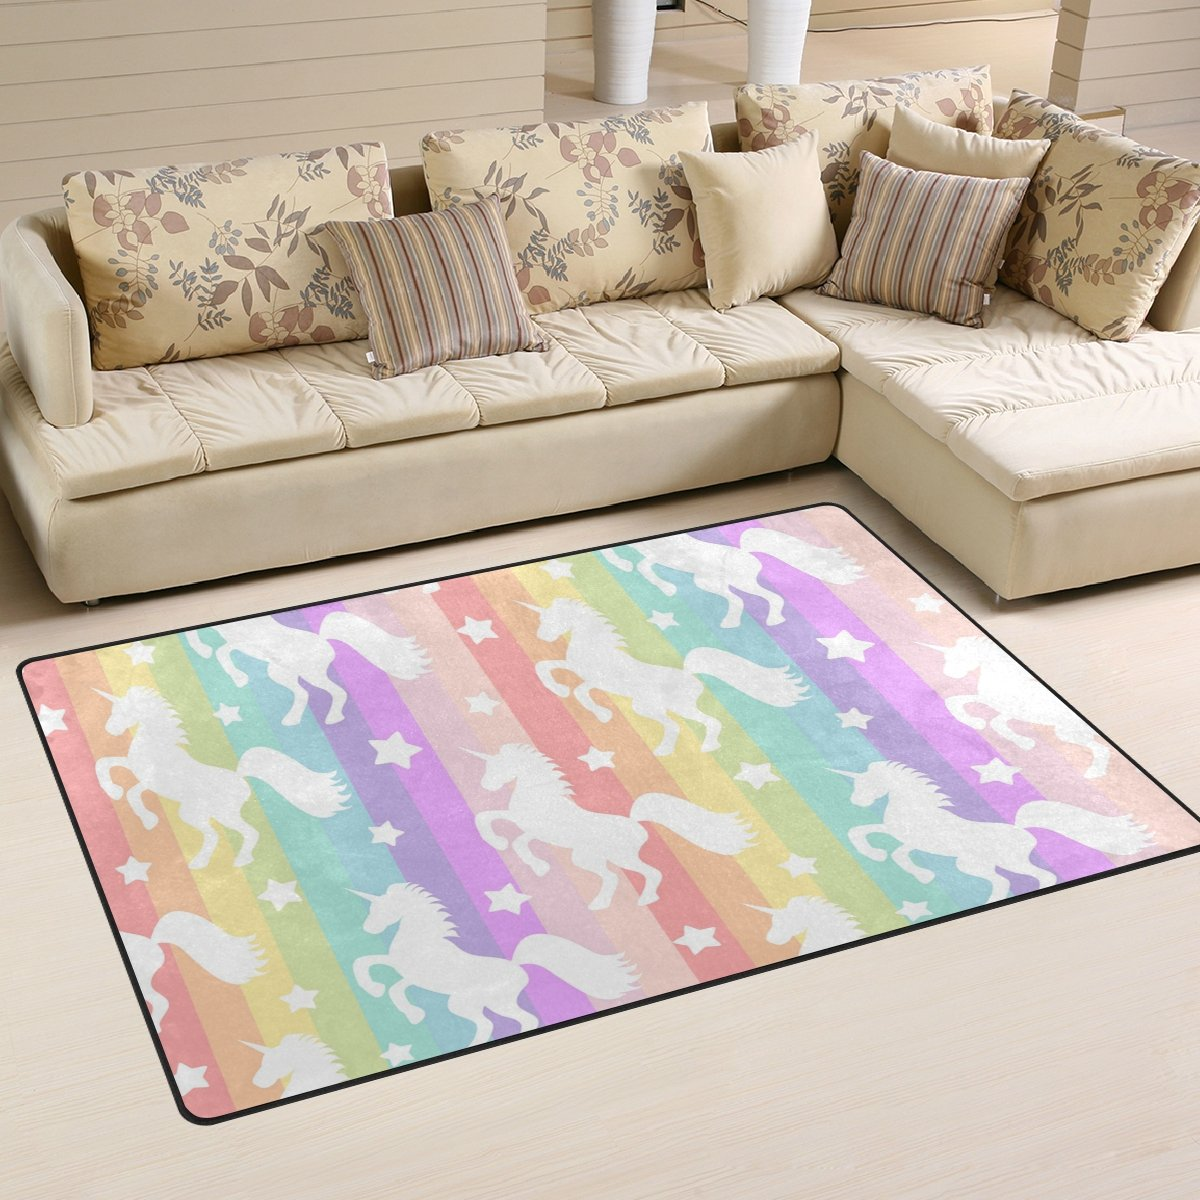 WellLee Area Rug,Cute Unicorns Silhouette On Rainbow Striped Pattern Floor Rug Non-Slip Doormat for Living Dining Dorm Room Bedroom Decor 60x39 inch